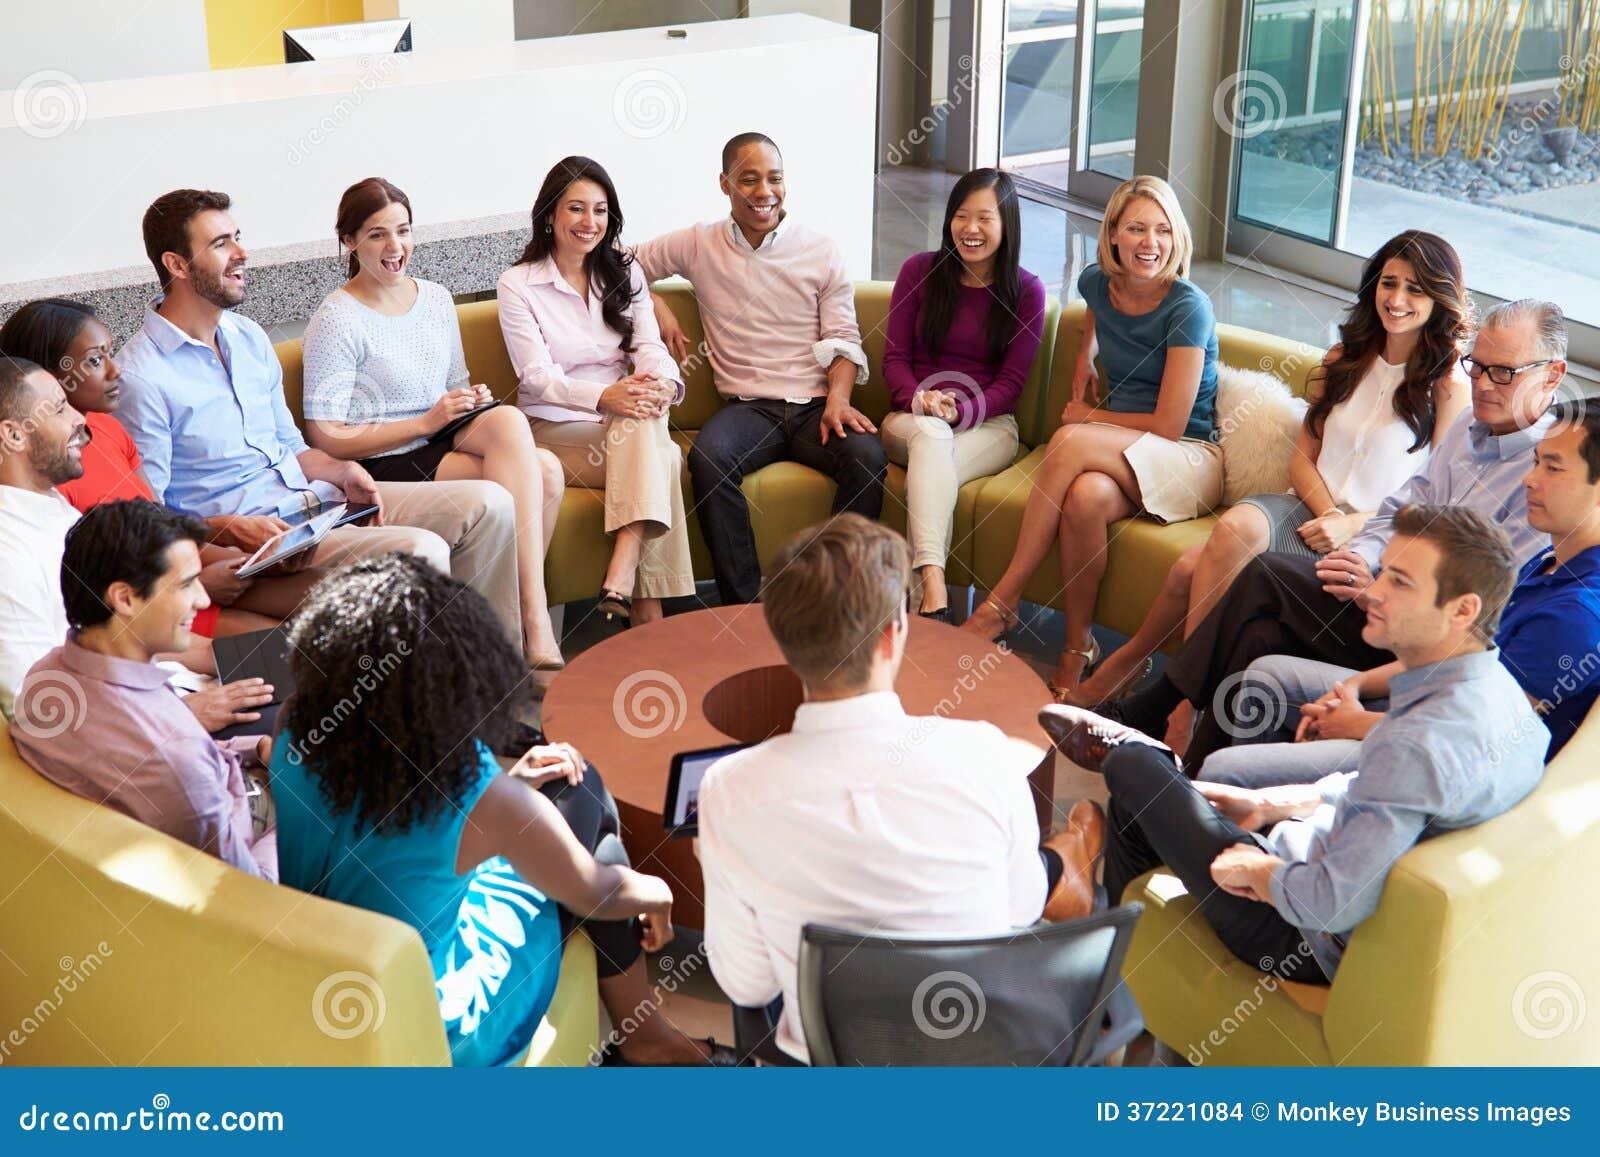 communication leadership multicultural